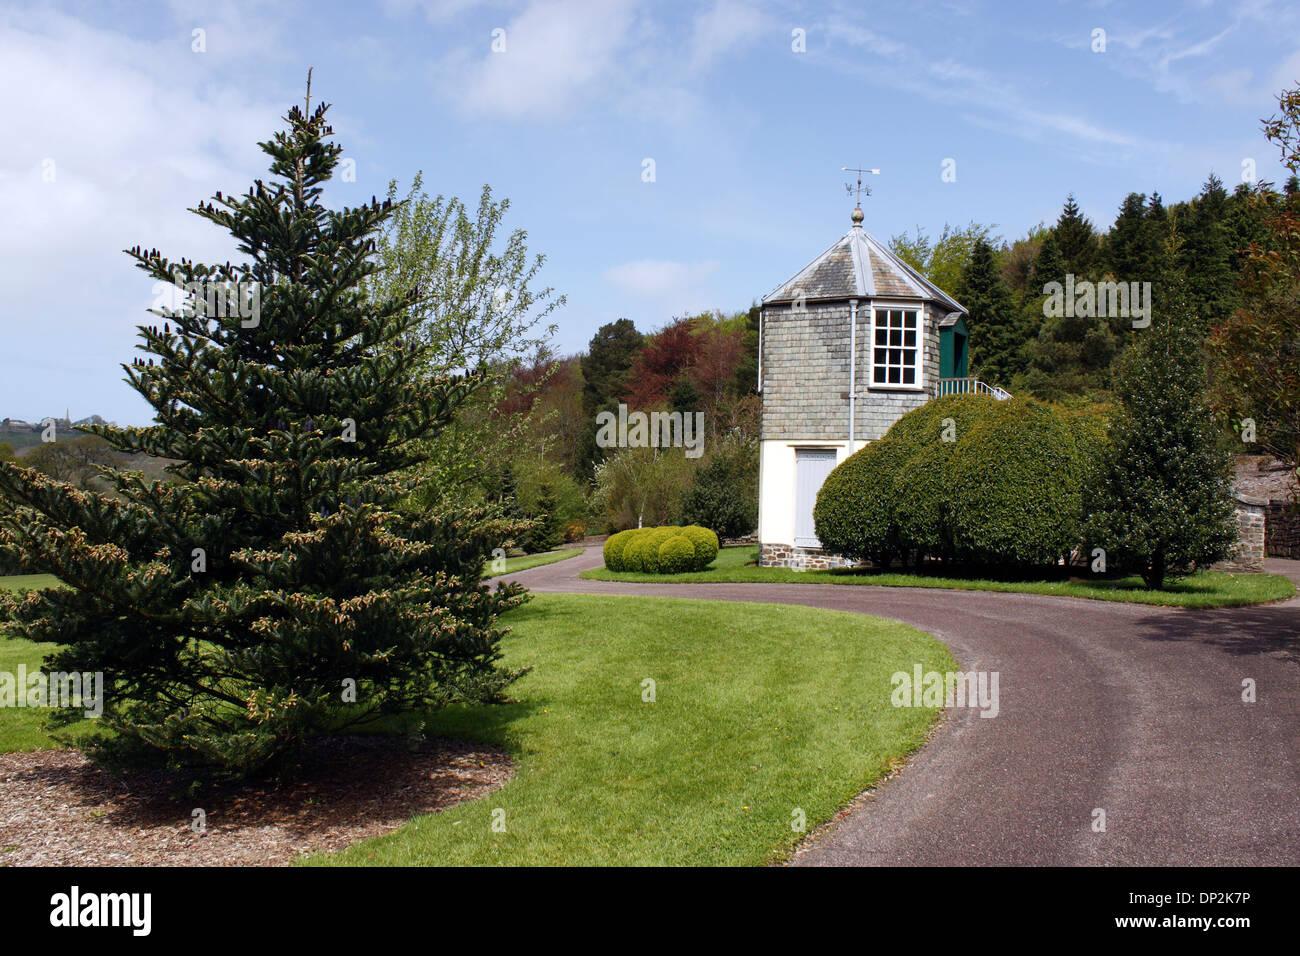 THE PALMER HOUSE GAZEBO IN THE GROUNDS OF RHS ROSEMOOR. DEVON UK. - Stock Image